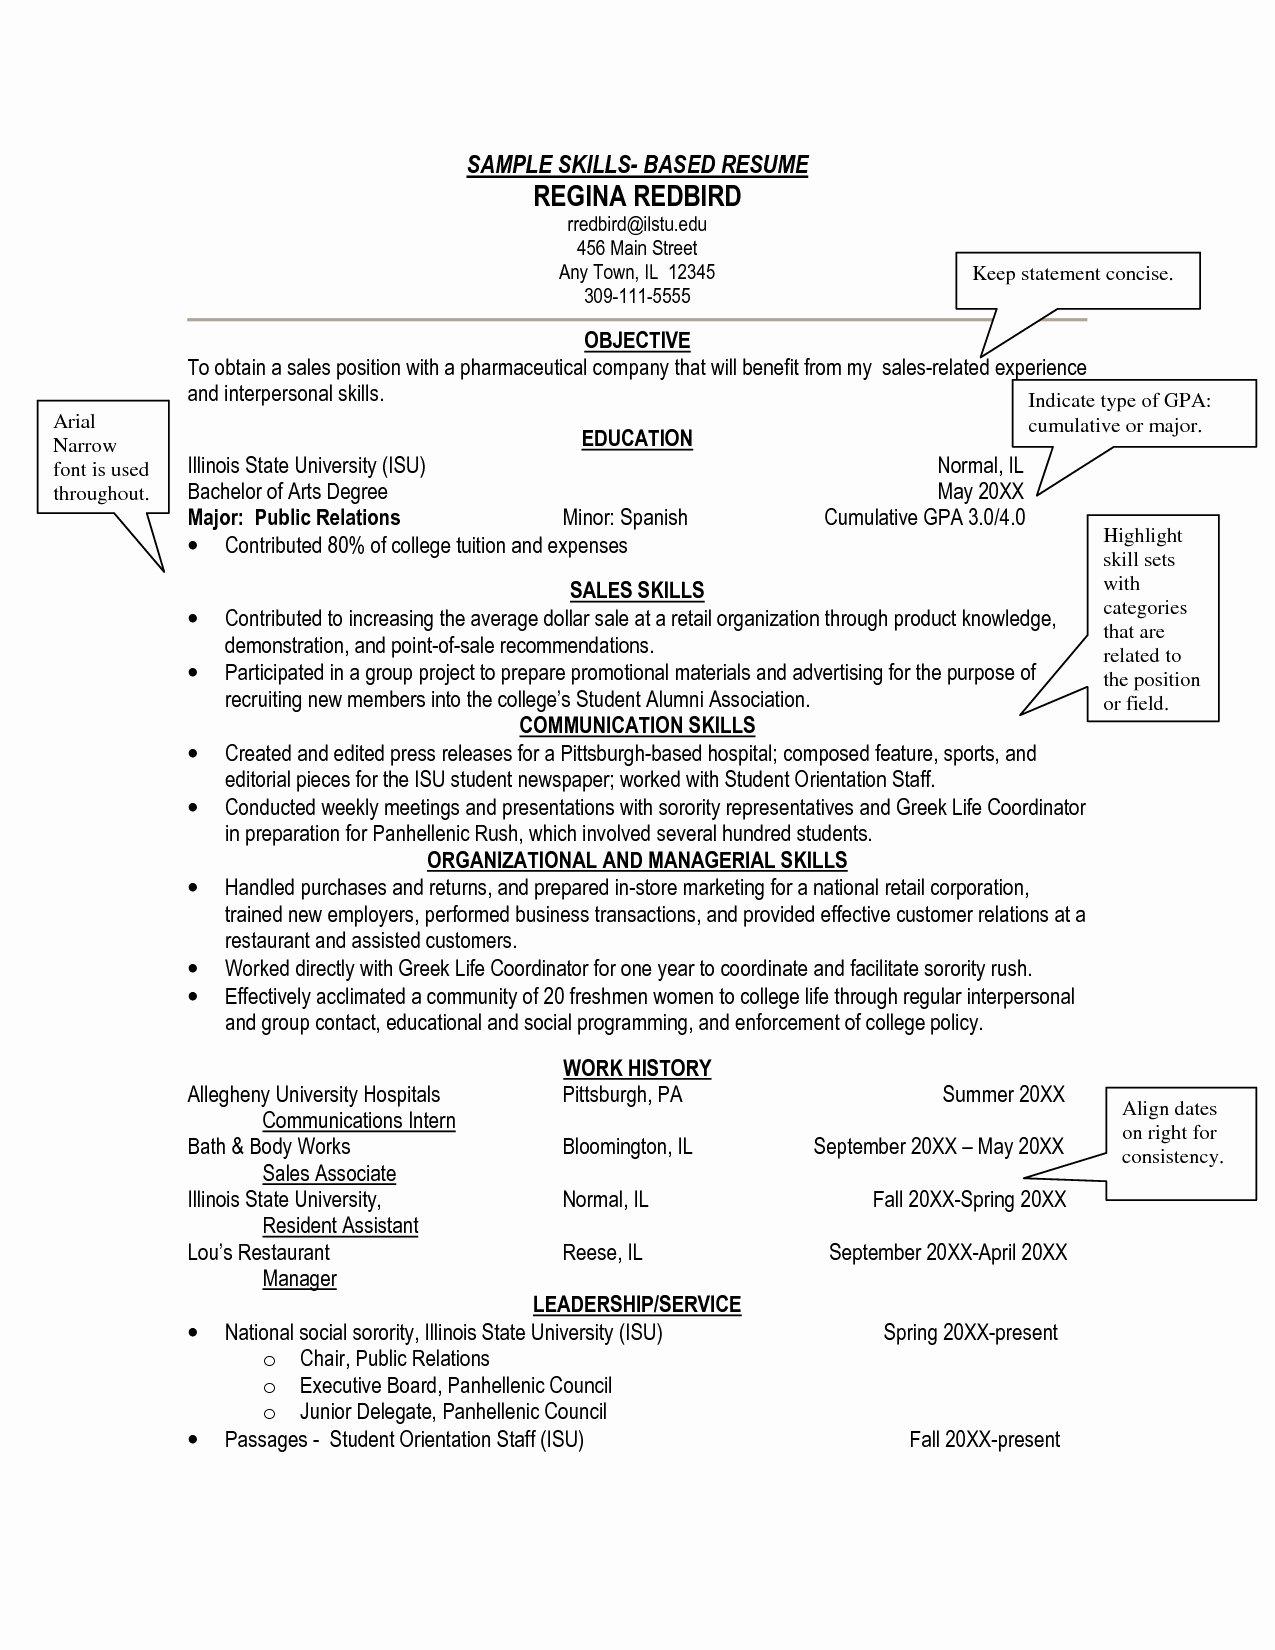 Skill Sets Resume